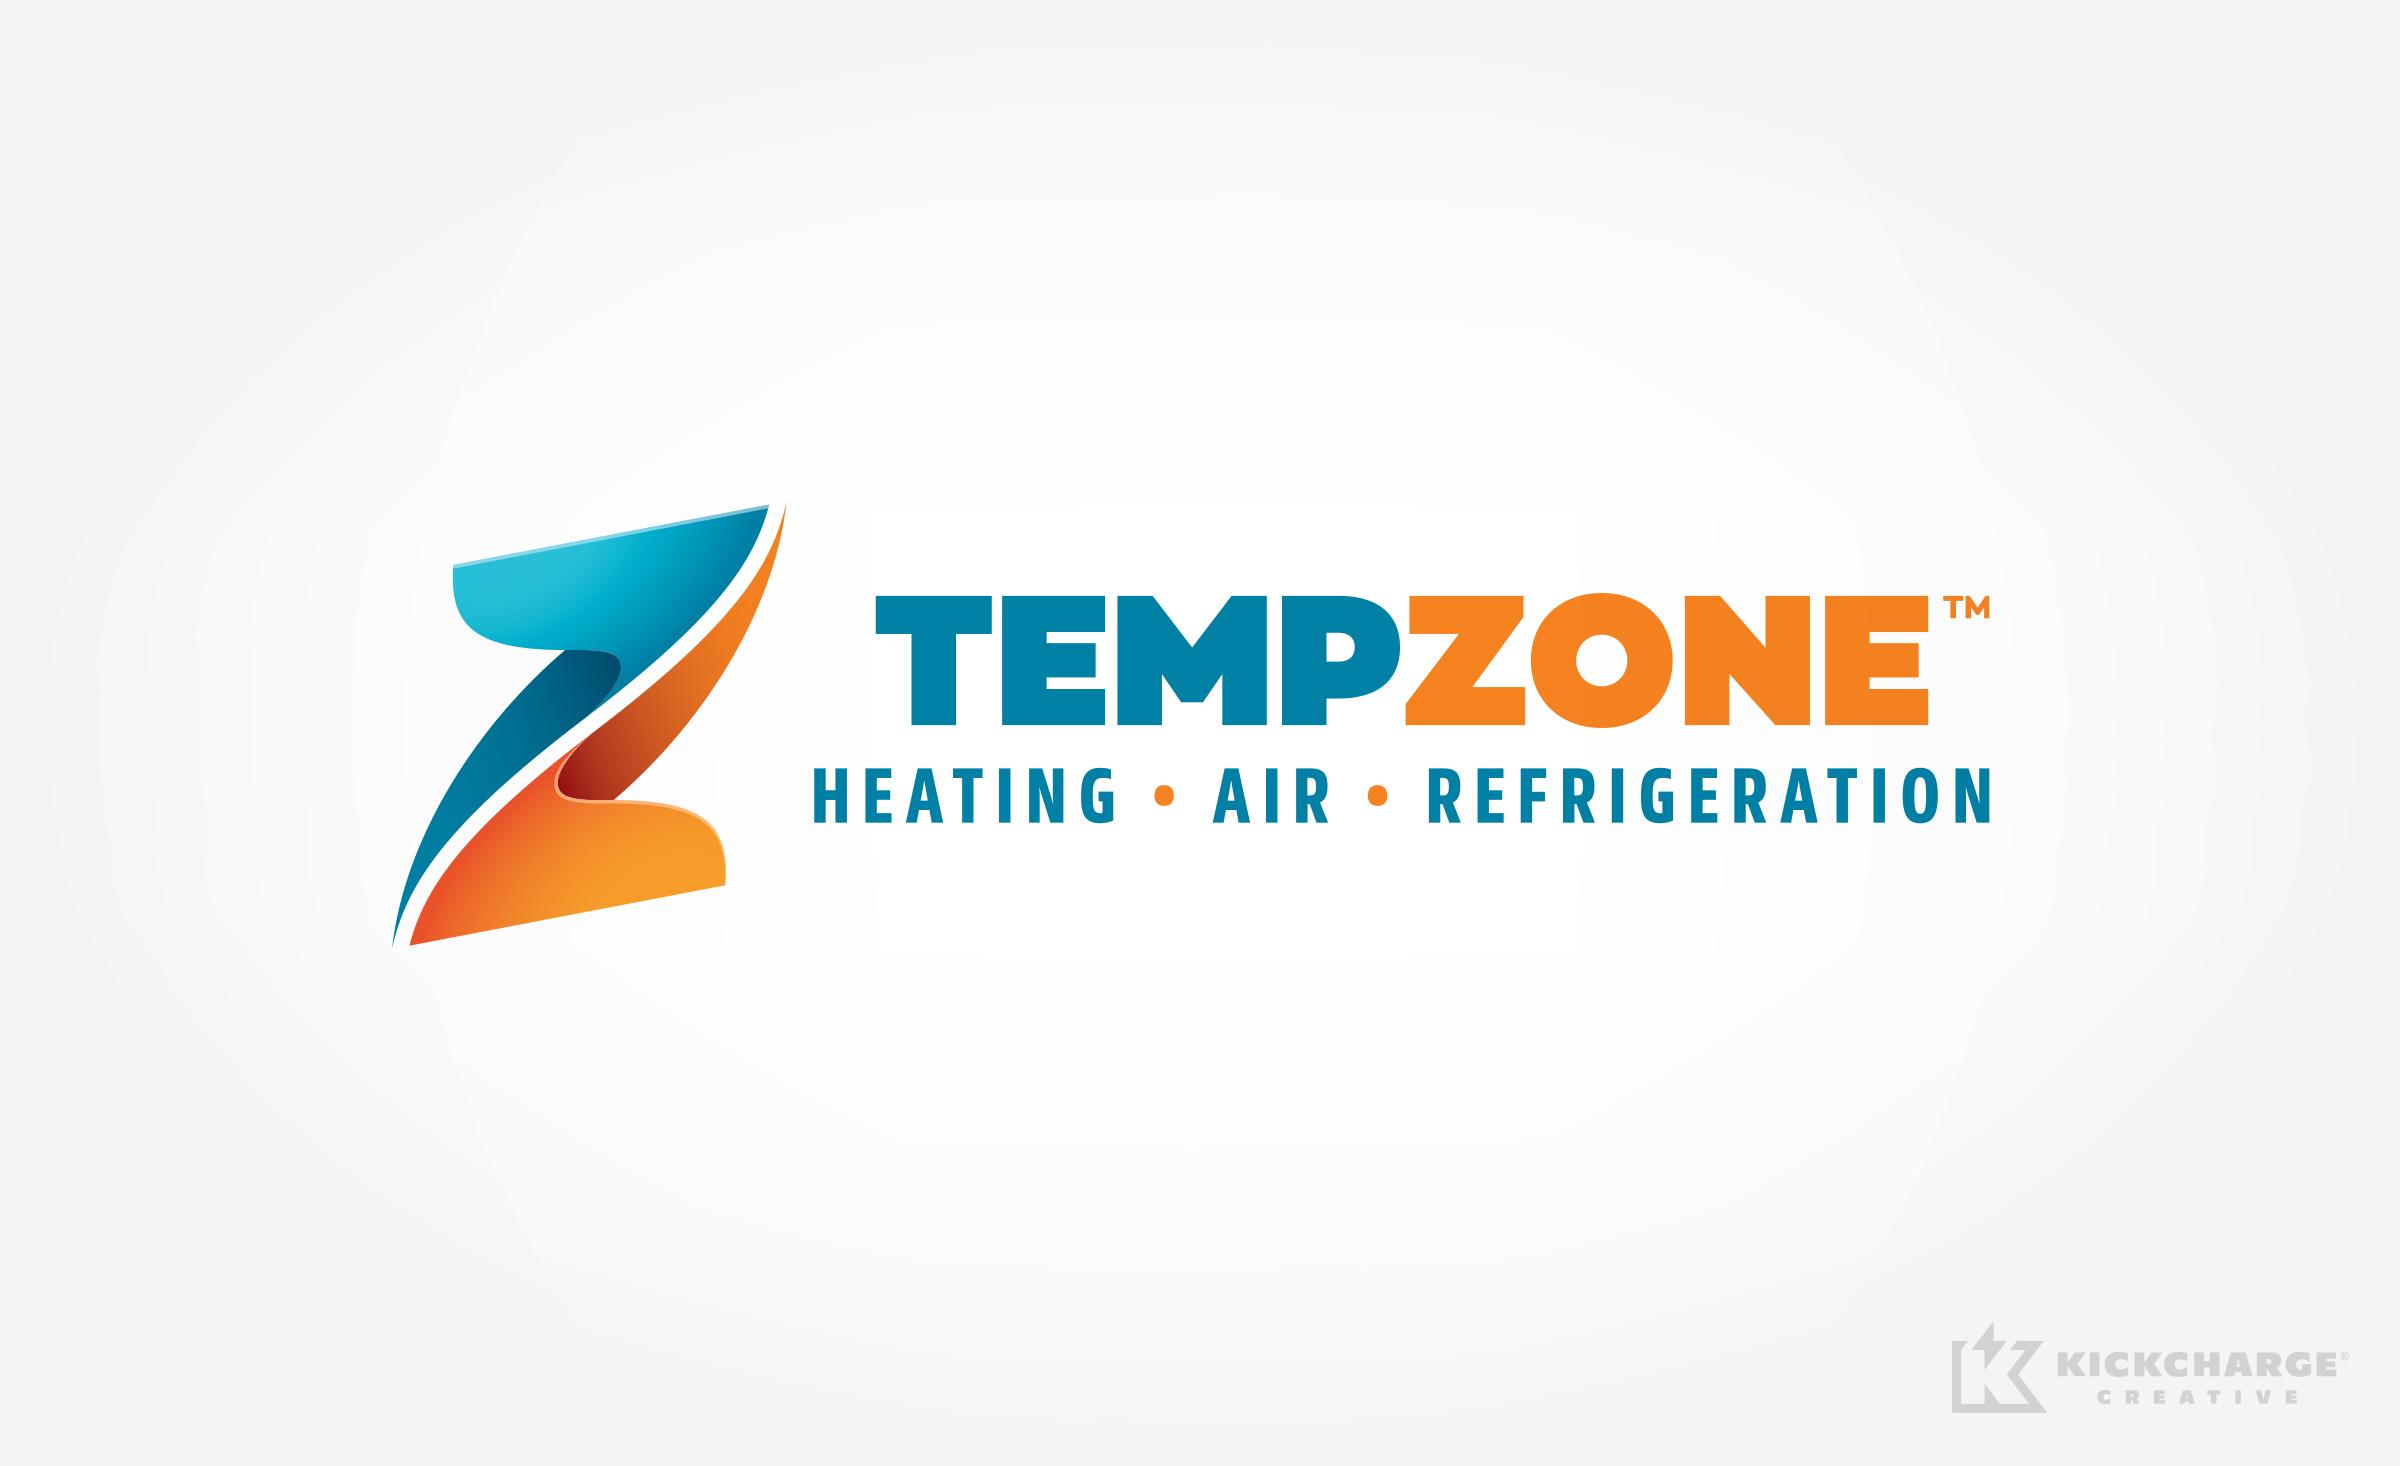 hvac logo for TempZone